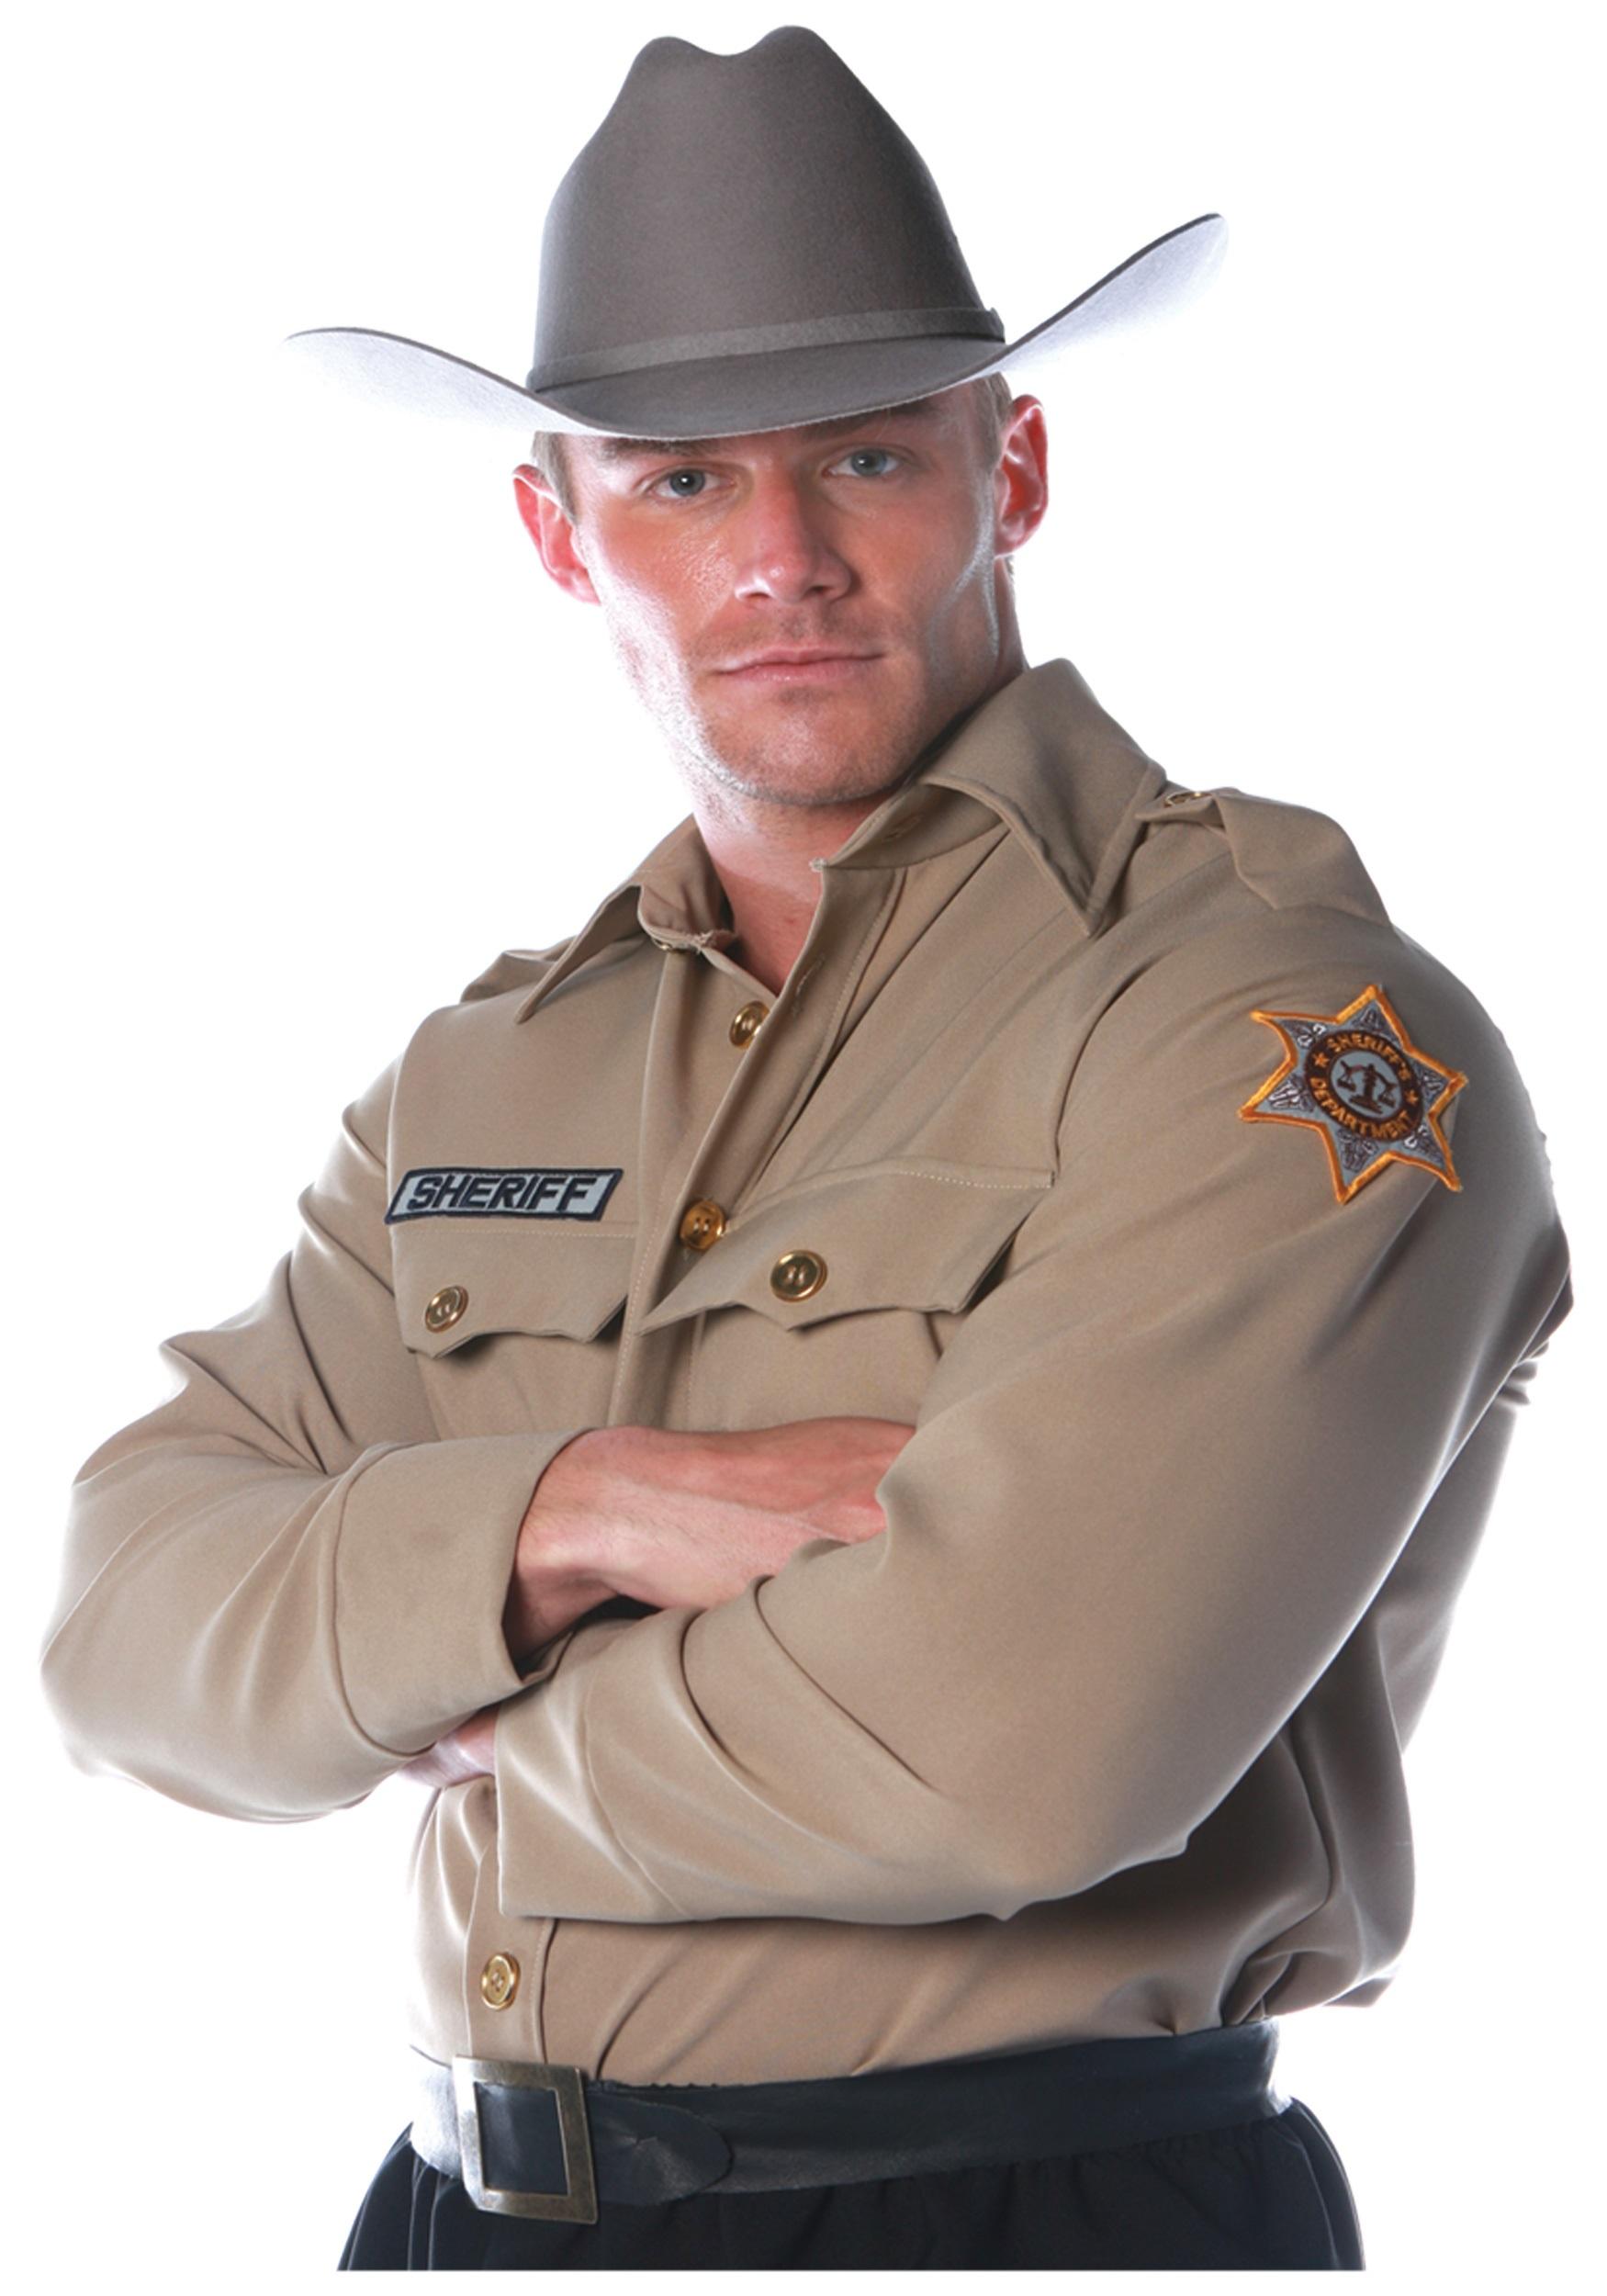 b5819120e91 mens-sheriff-shirt.jpg